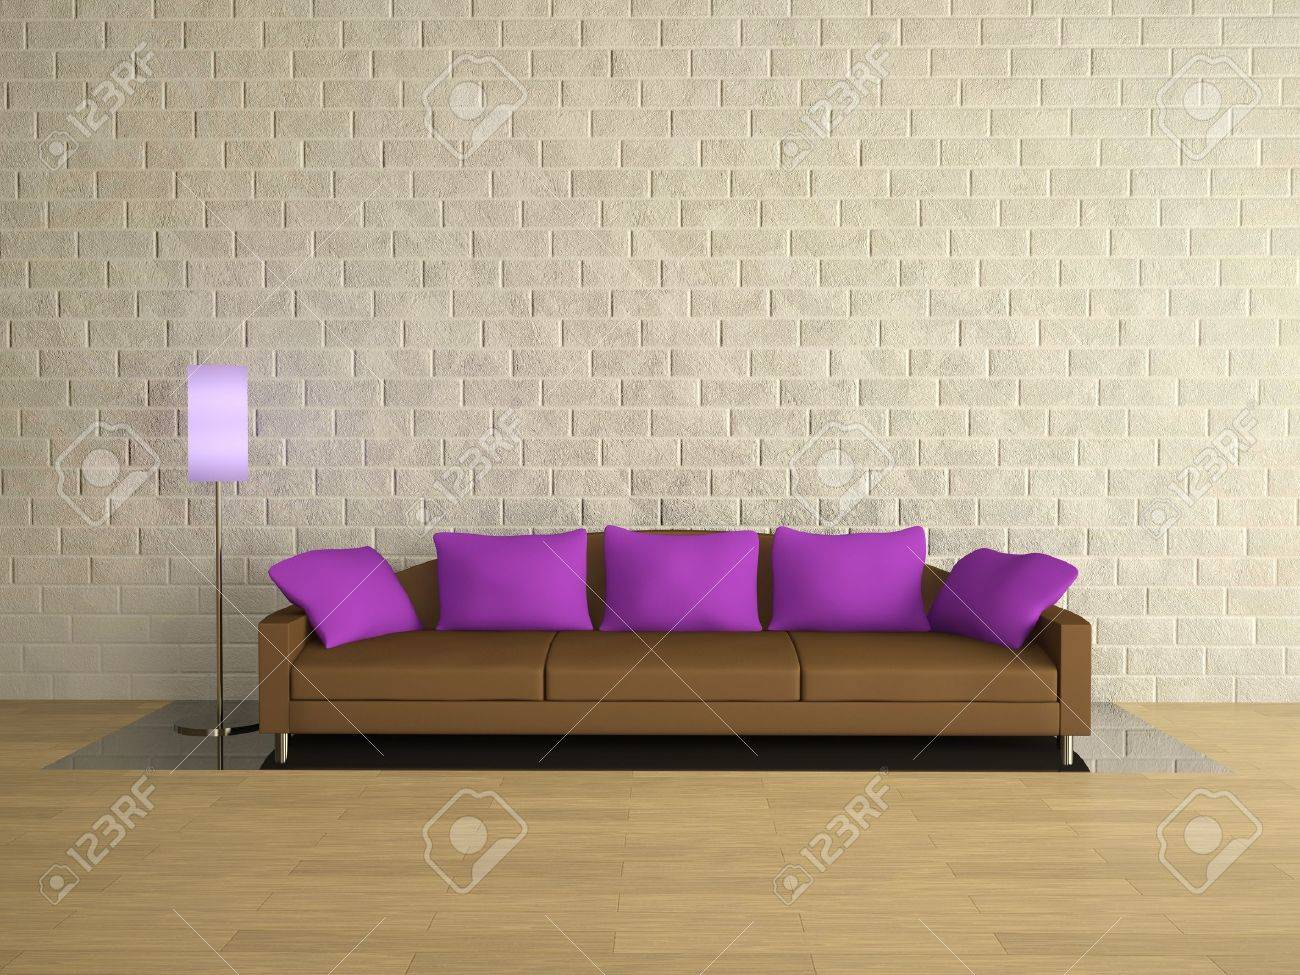 Brown sofa with lilac pillows near a brick wall Stock Photo - 12910988